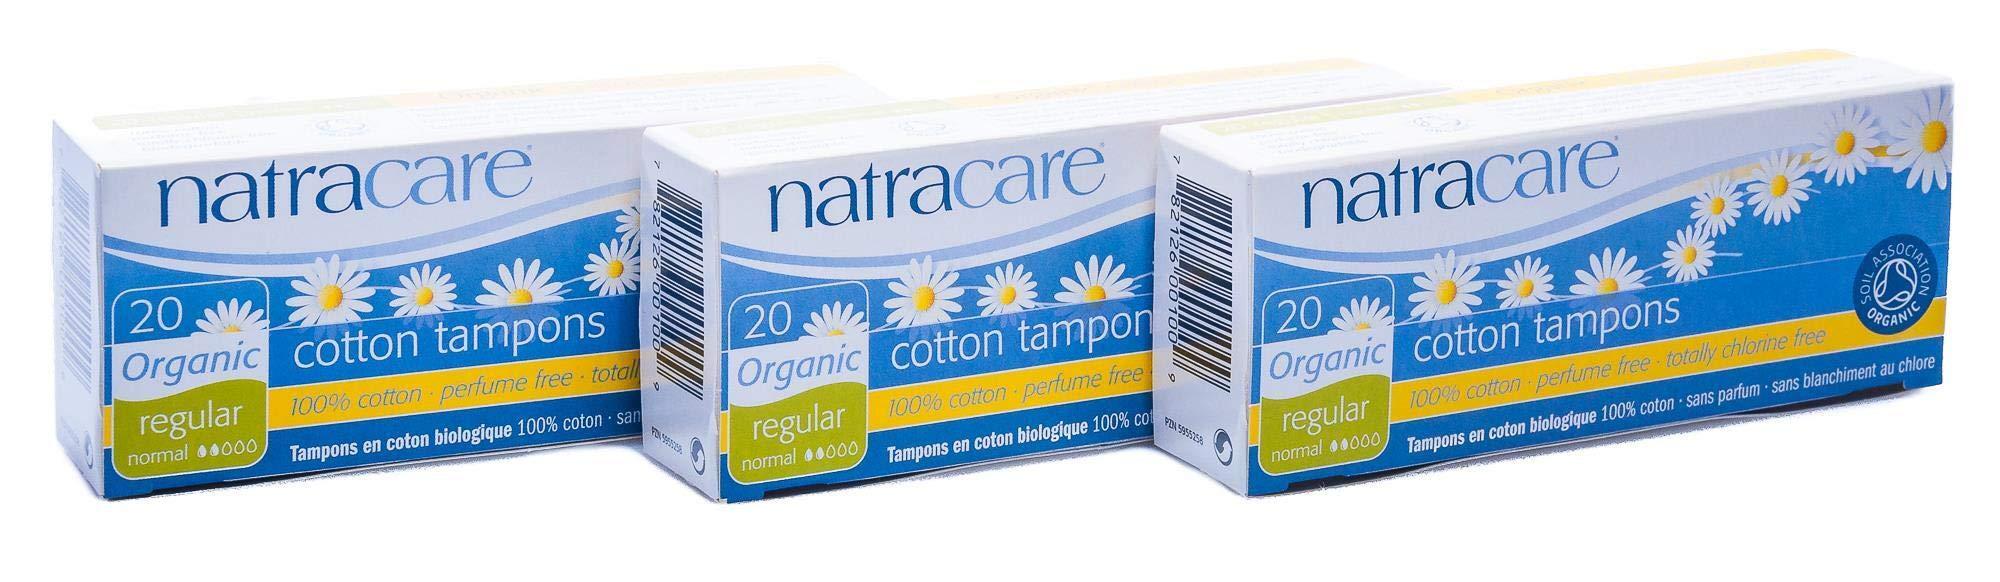 PACK OF 3 Natracare Organic Tampons Regular (non-applicator)